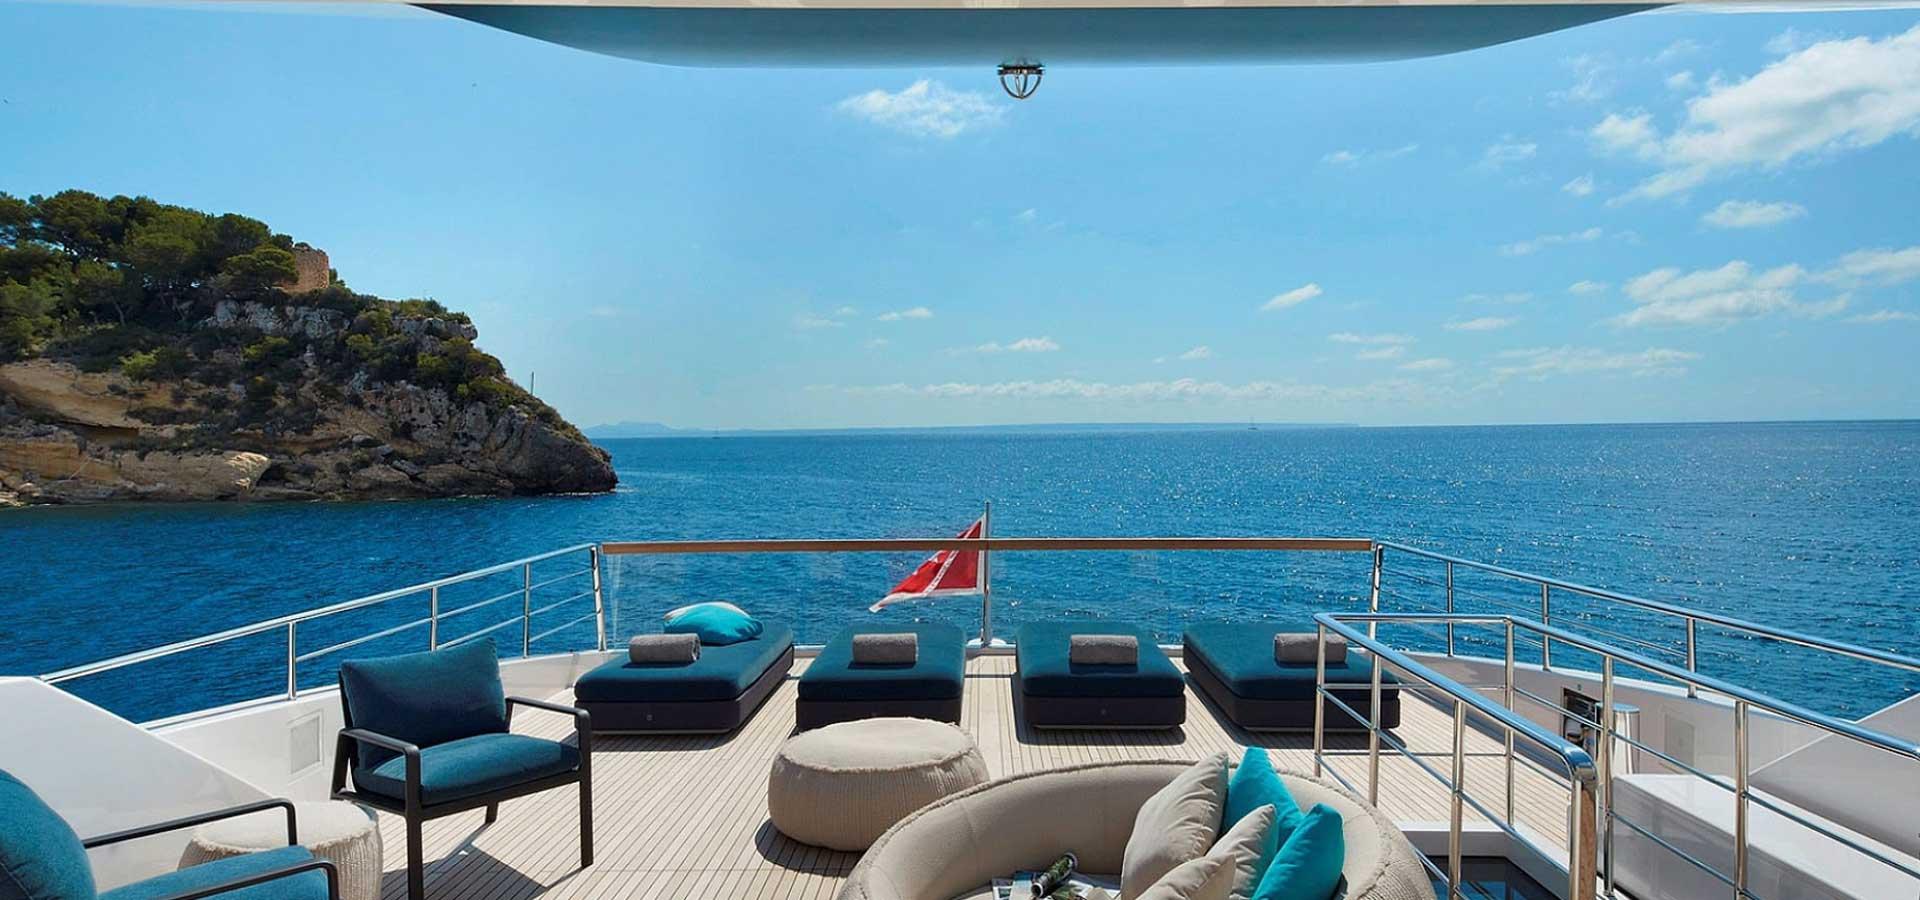 Simpson Yacht Charter